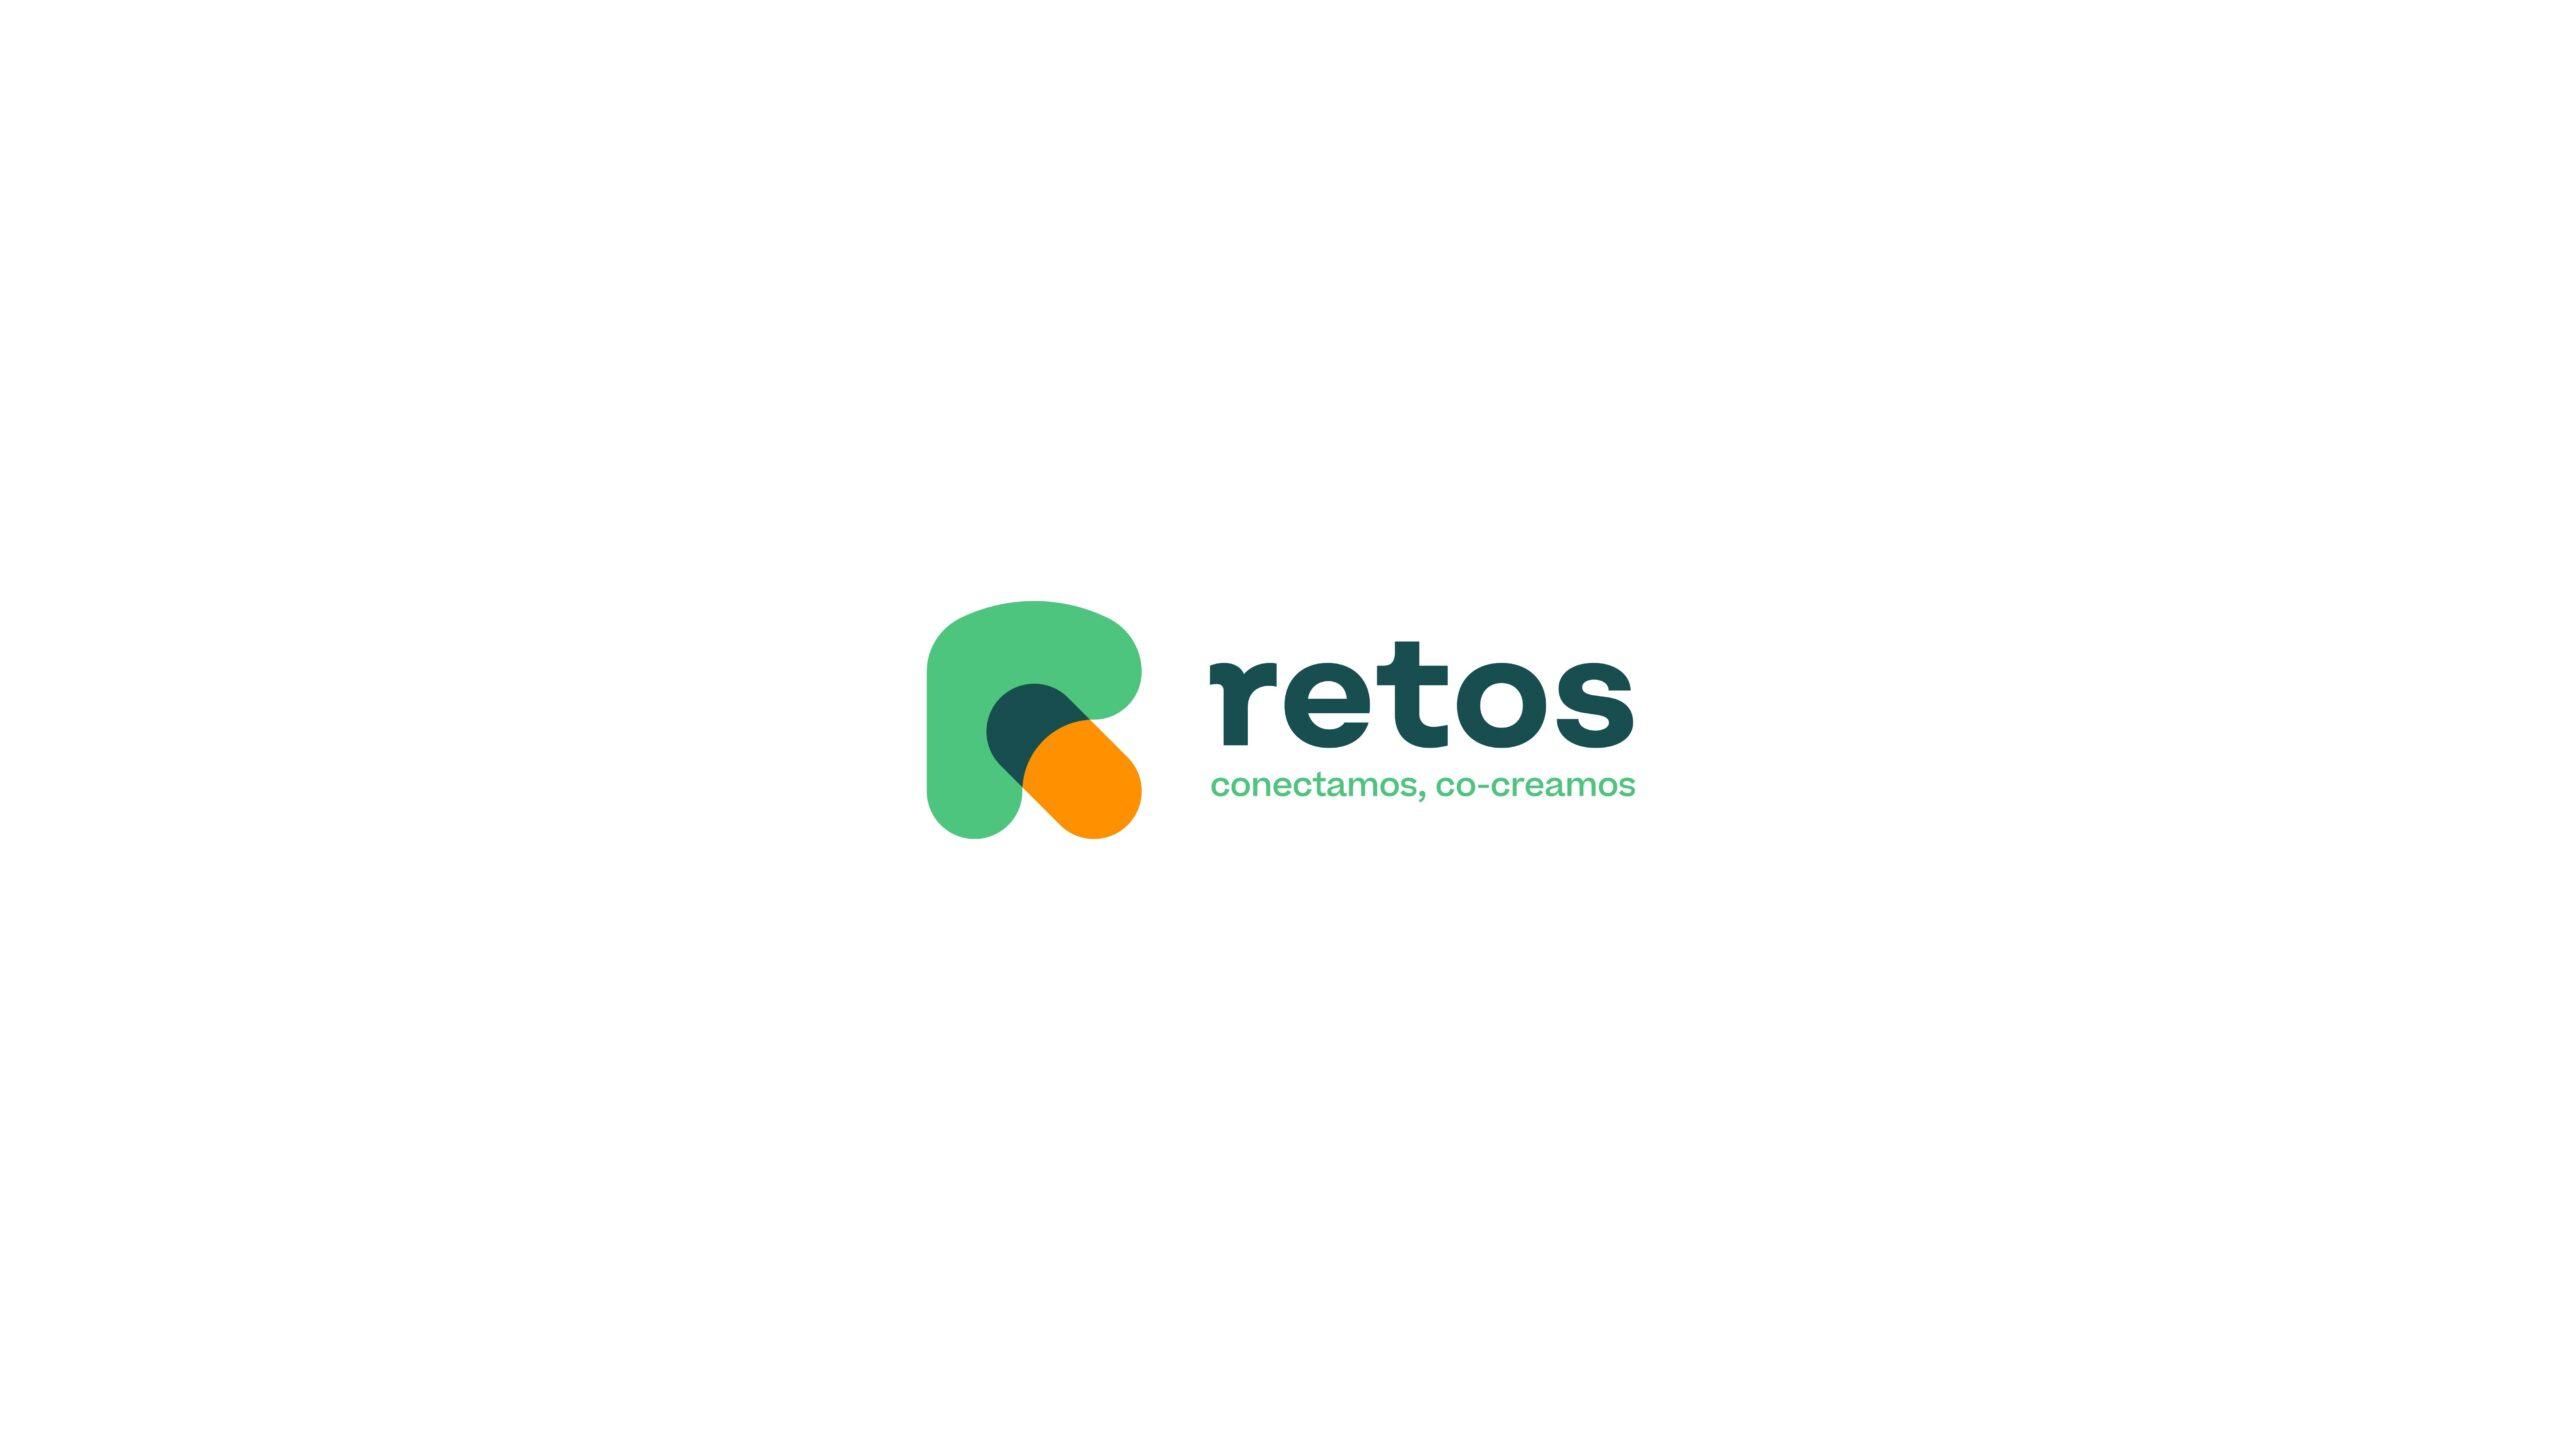 RETOS_Logo_Slogan-02